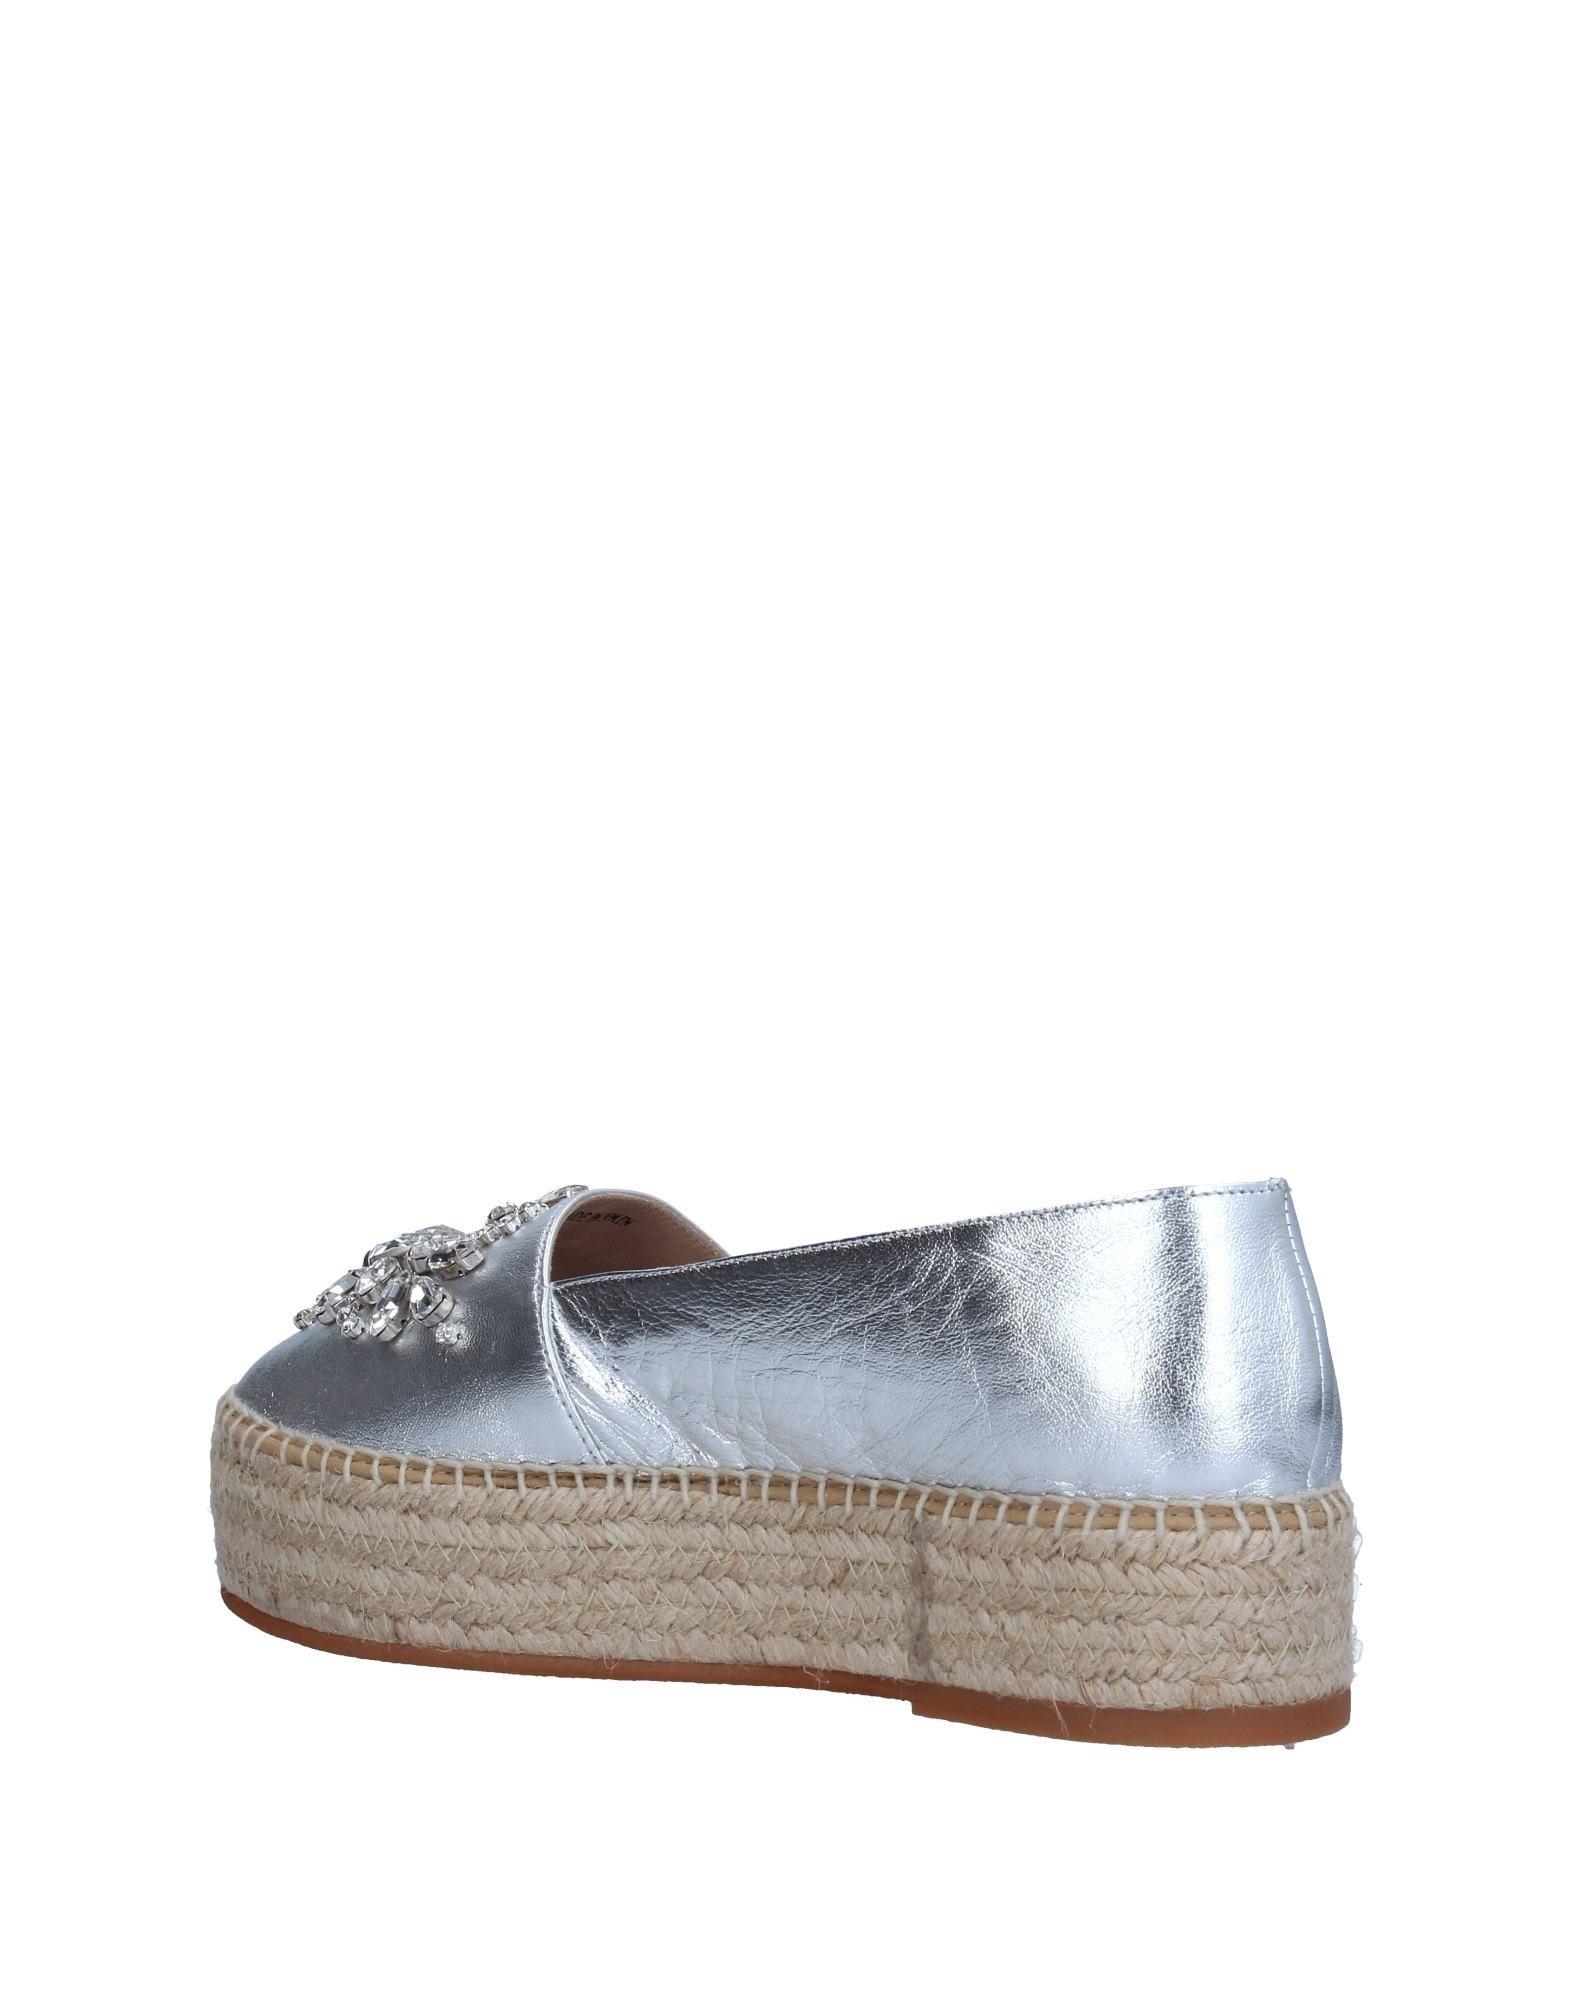 Schuhe Sebastian Espadrilles Damen  11331591JQ Heiße Schuhe  87e6b0